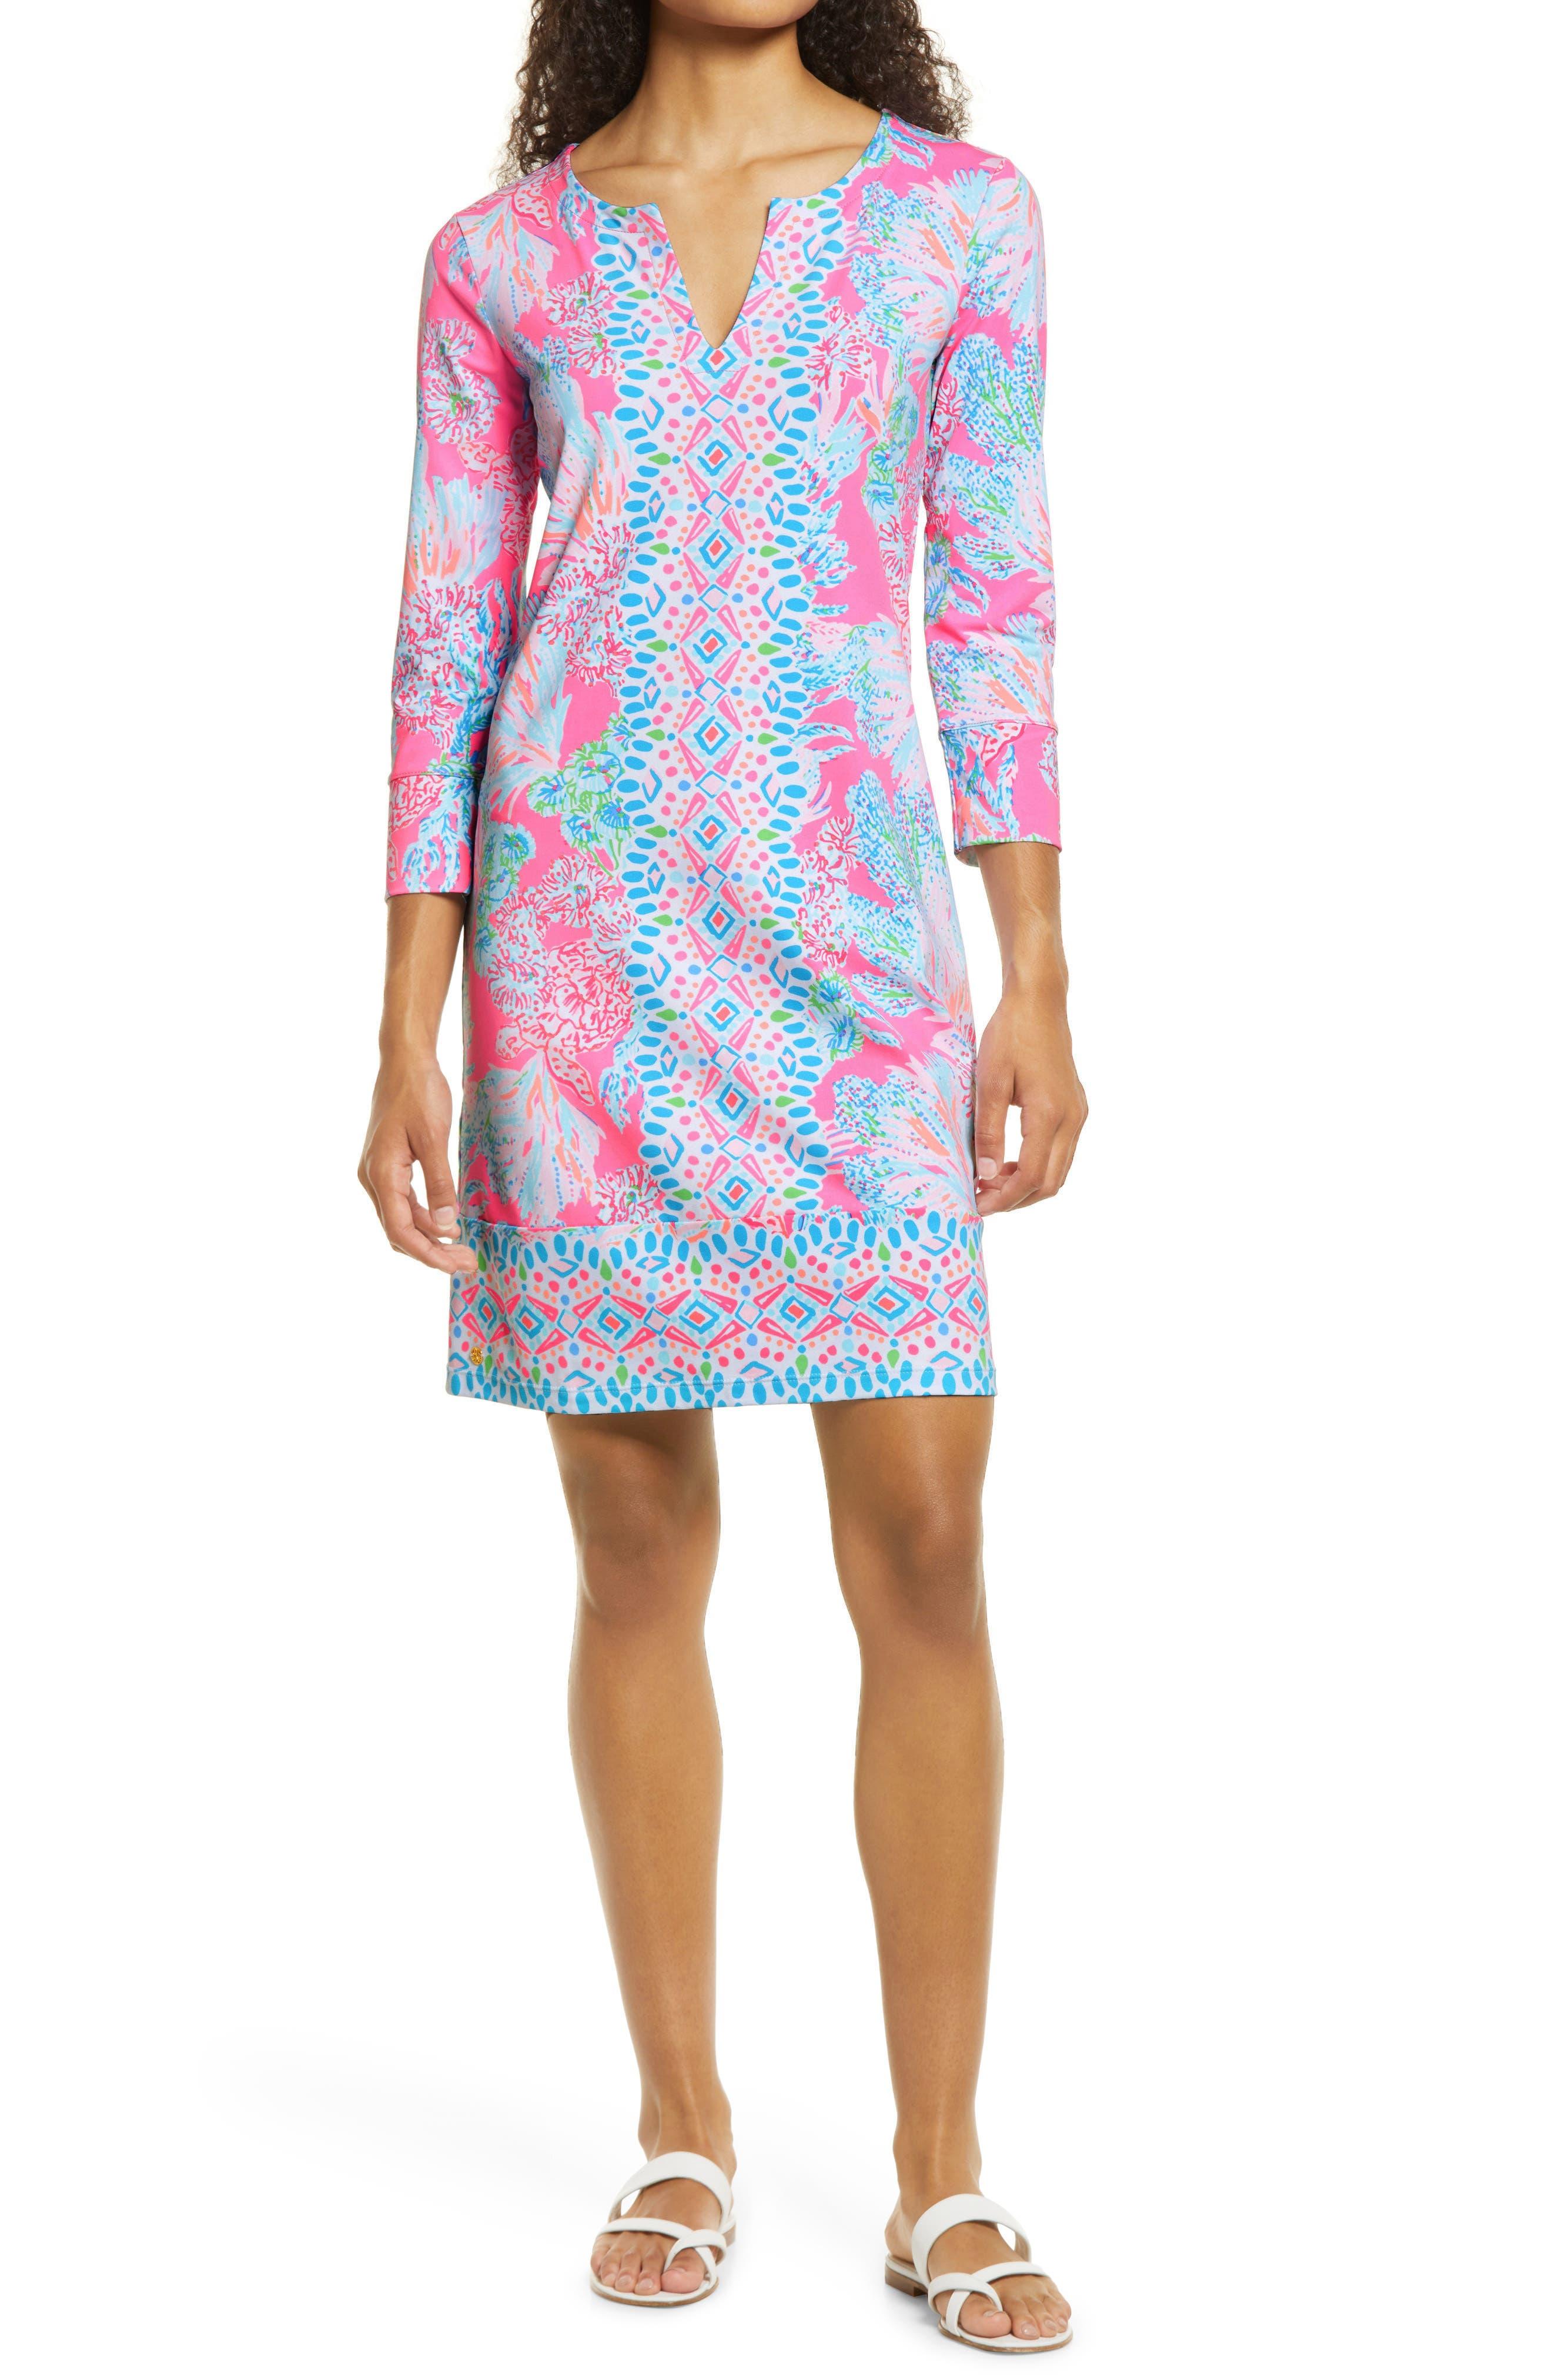 Women's Lilly Pulitzer Nadine Upf 50+ Shift Dress